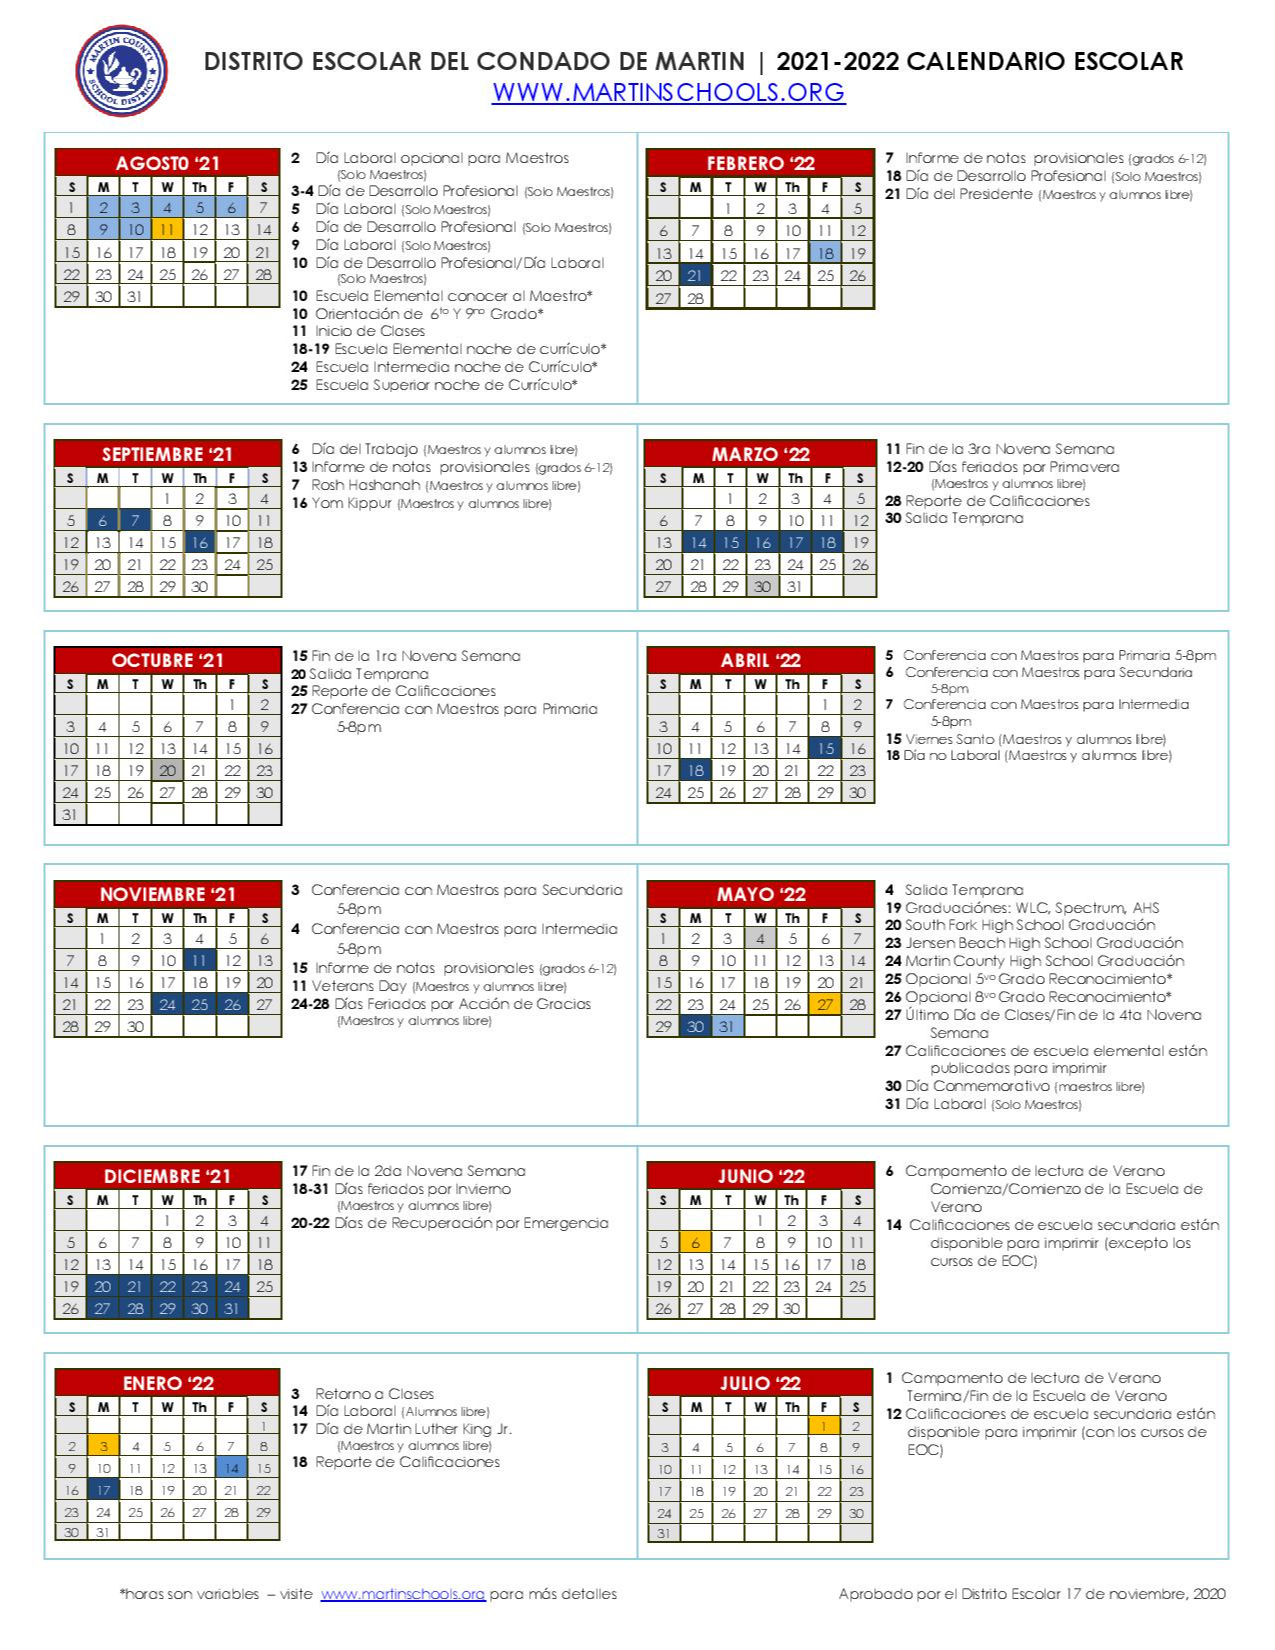 2021-2022 Instructional Calendar (Spanish)